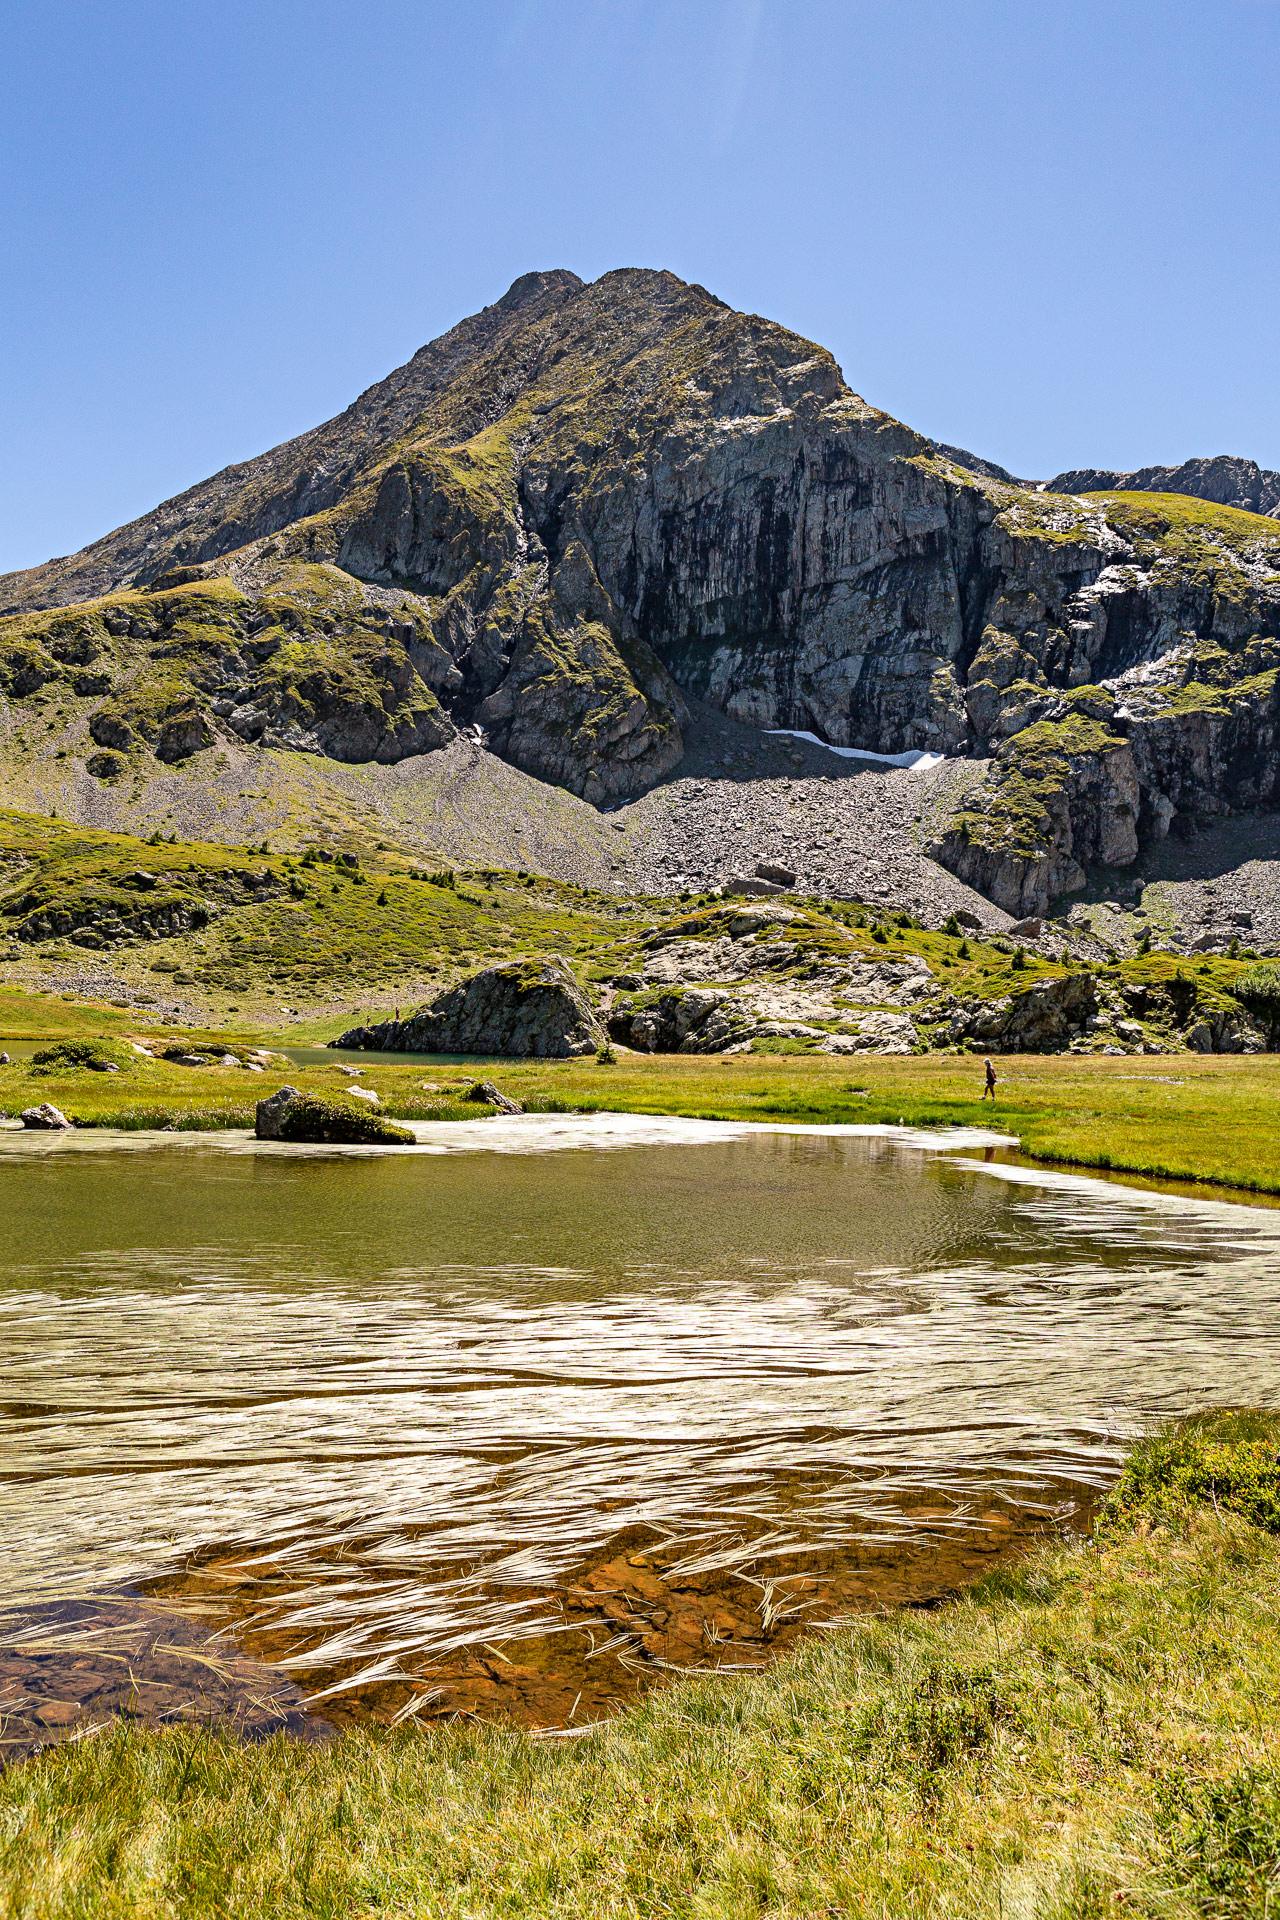 Randonnée plateau lac Fourchu Alpe du Grand Serre